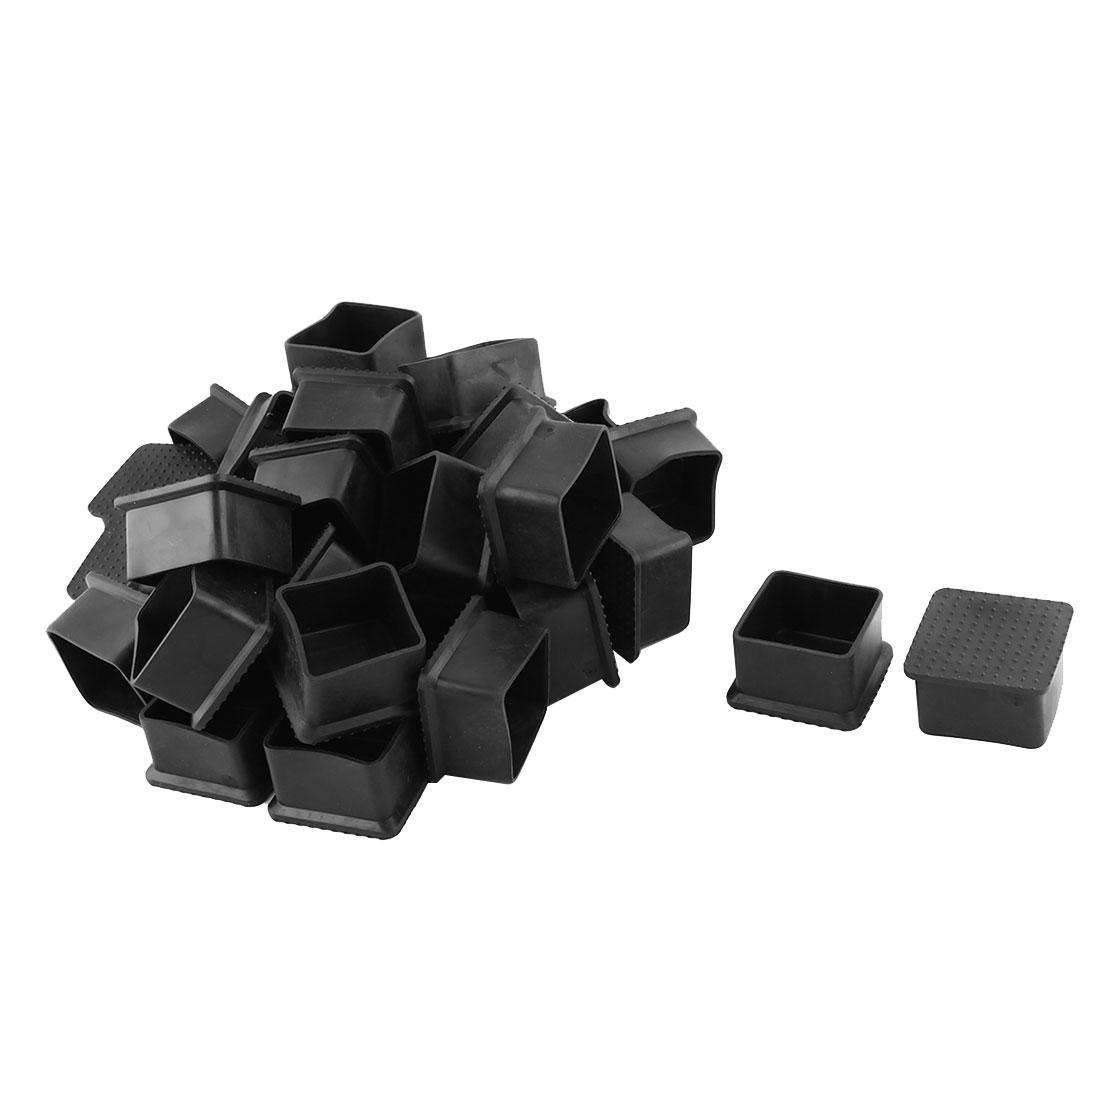 Home Rubber Anti-slip Furniture Chair Desk Foot Protector Cover Black 33 Pcs